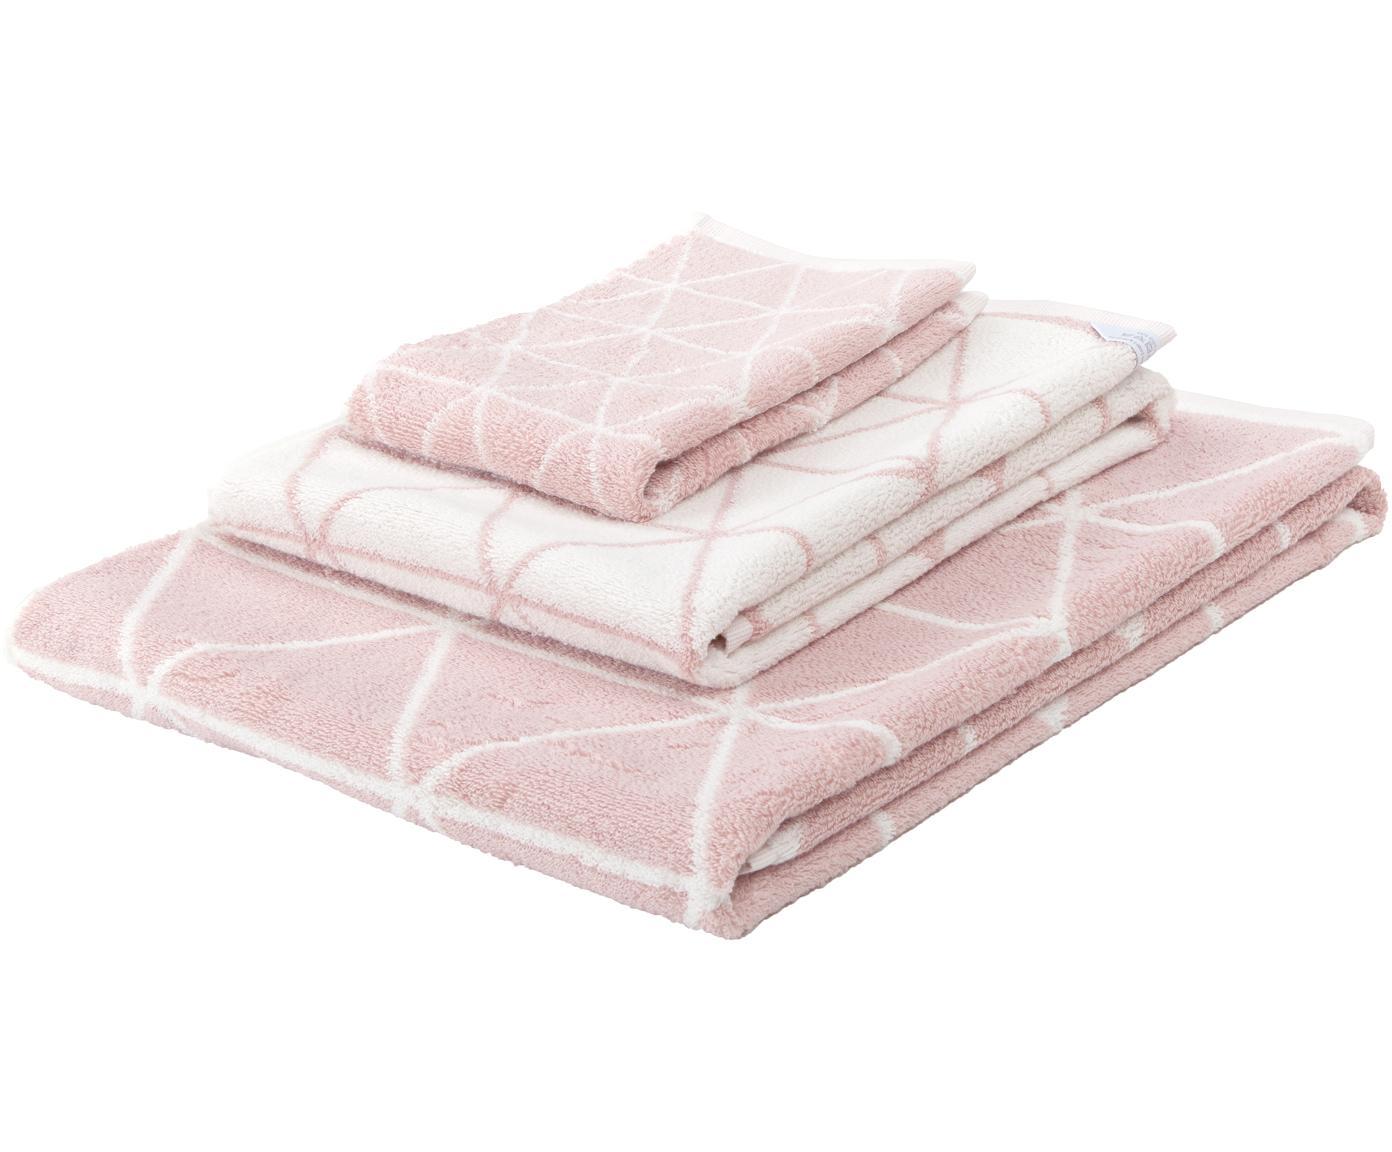 Set 3 asciugamani reversibili Elina, Rosa, bianco crema, Diverse dimensioni